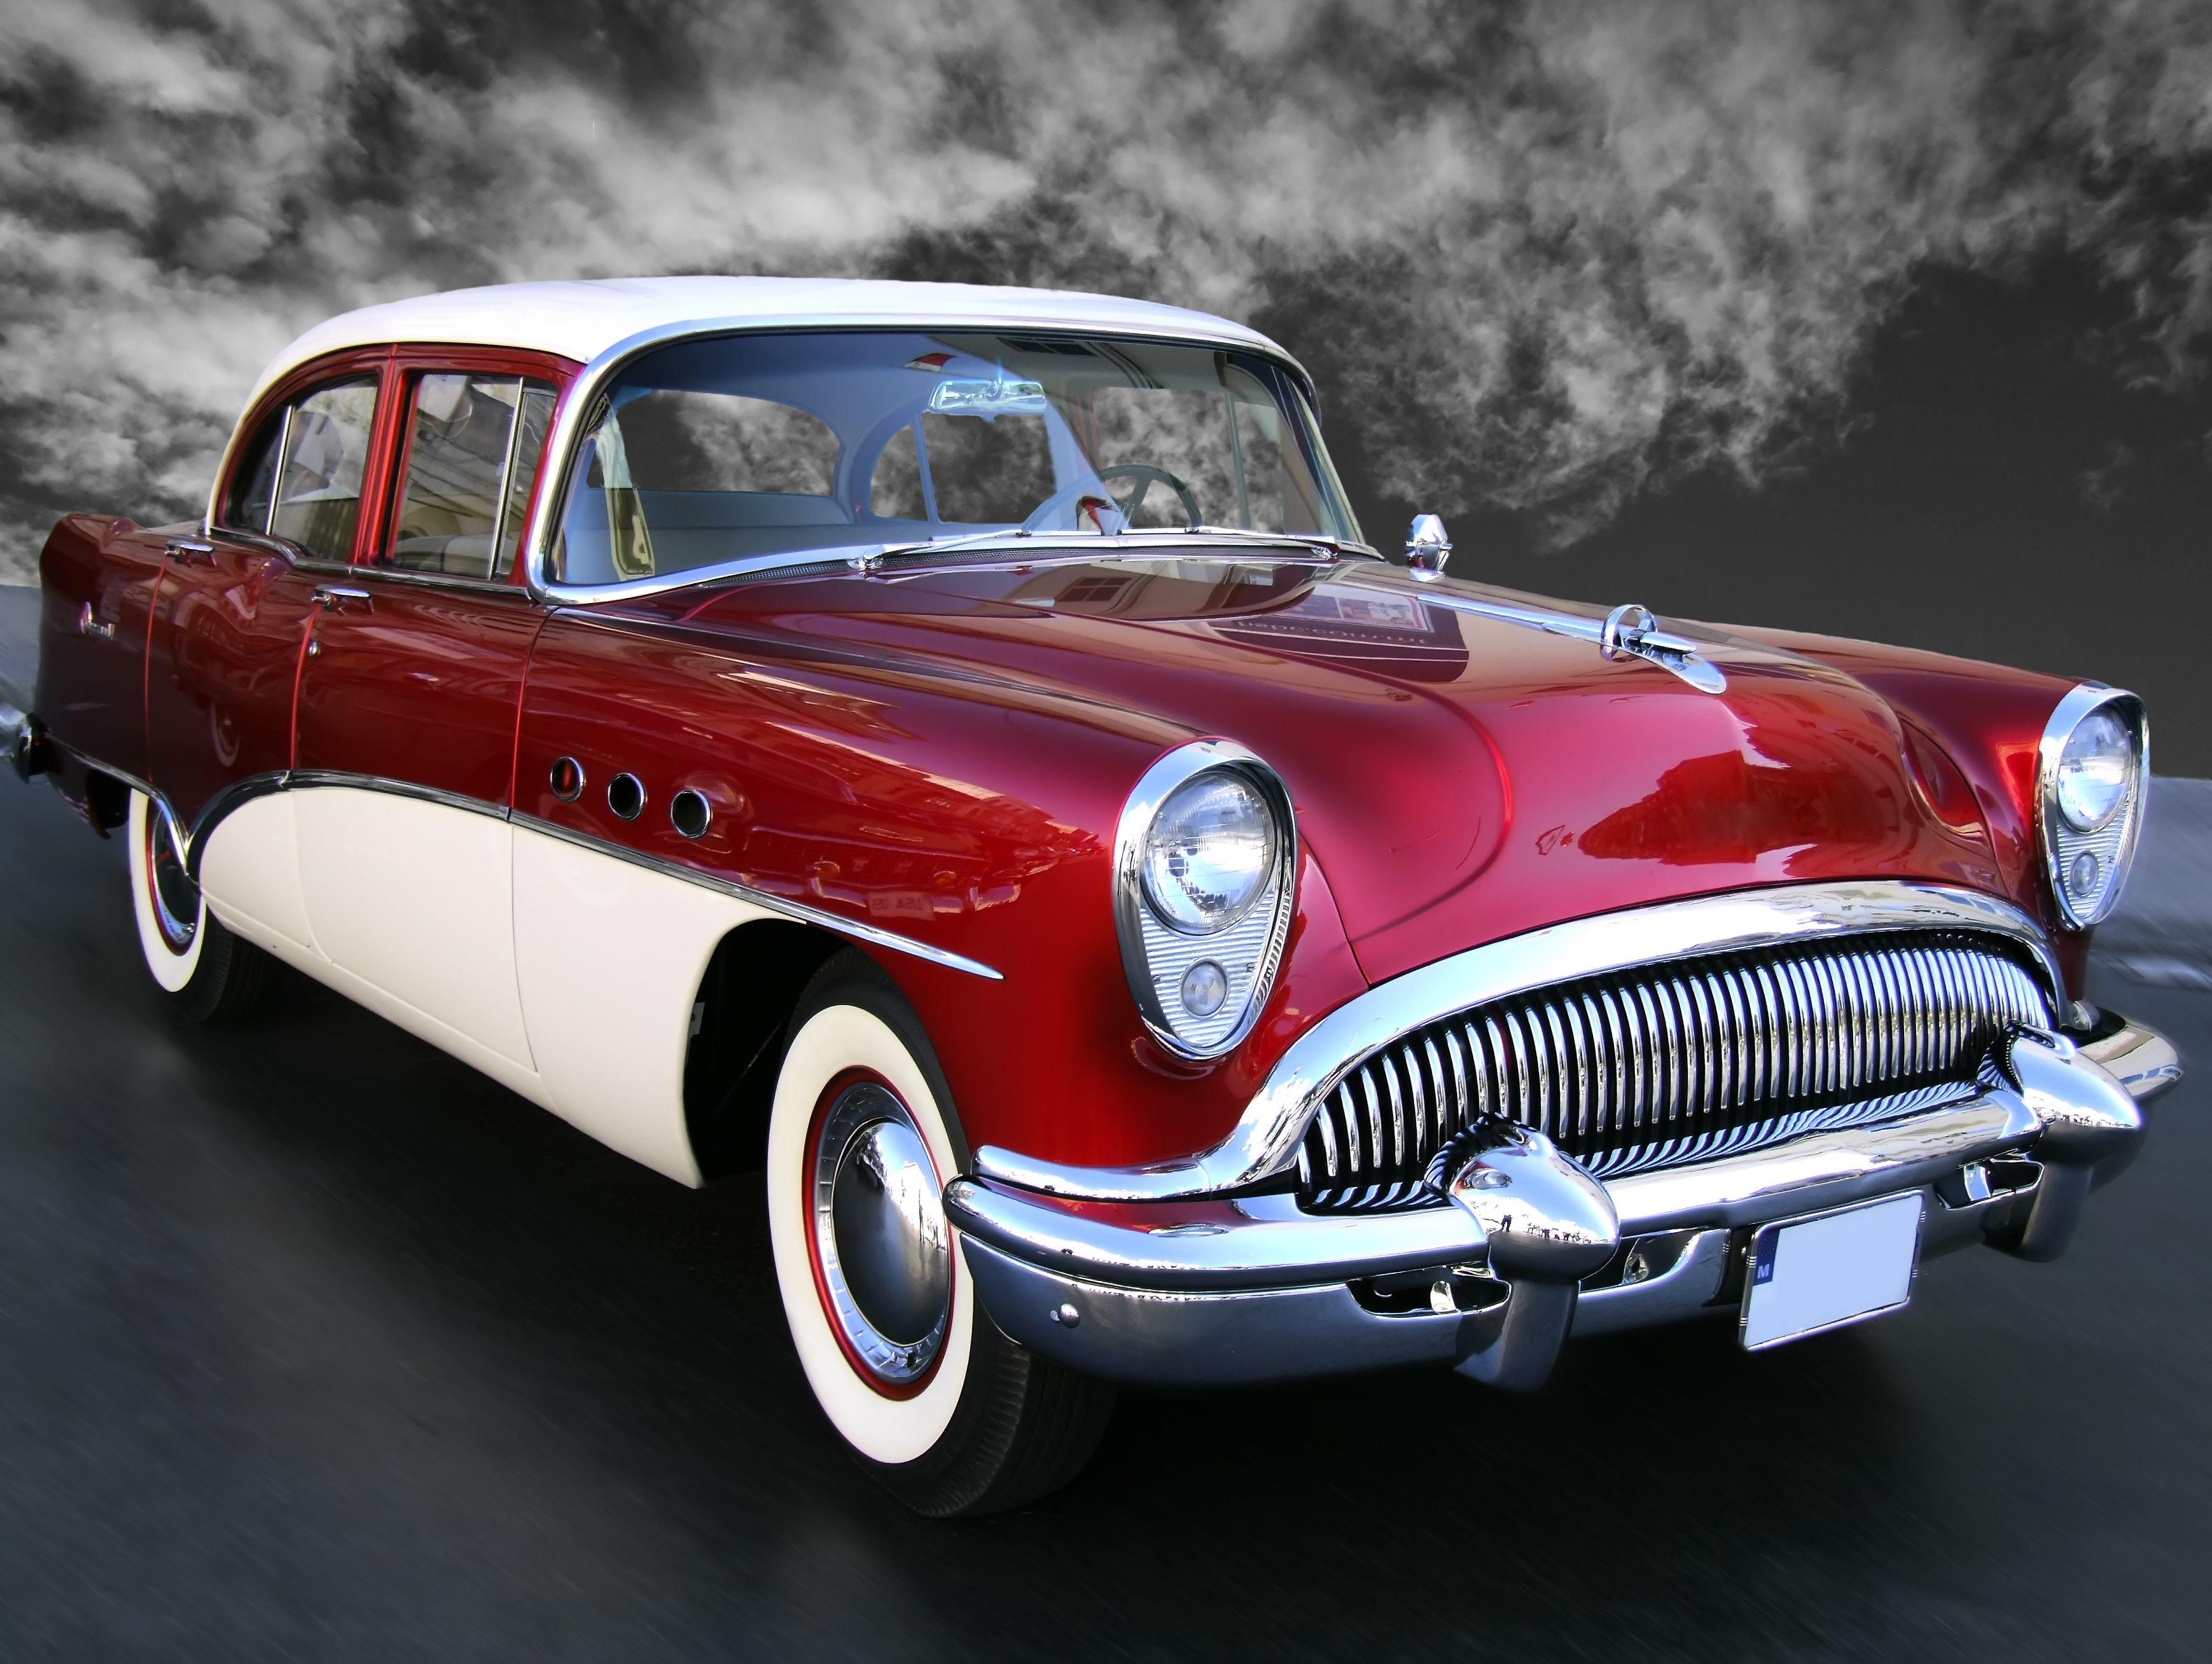 1968 buick electra 225 2 door hardtop front 3 4 81136 - 25 Beautiful Antique Cars For Car Lovers